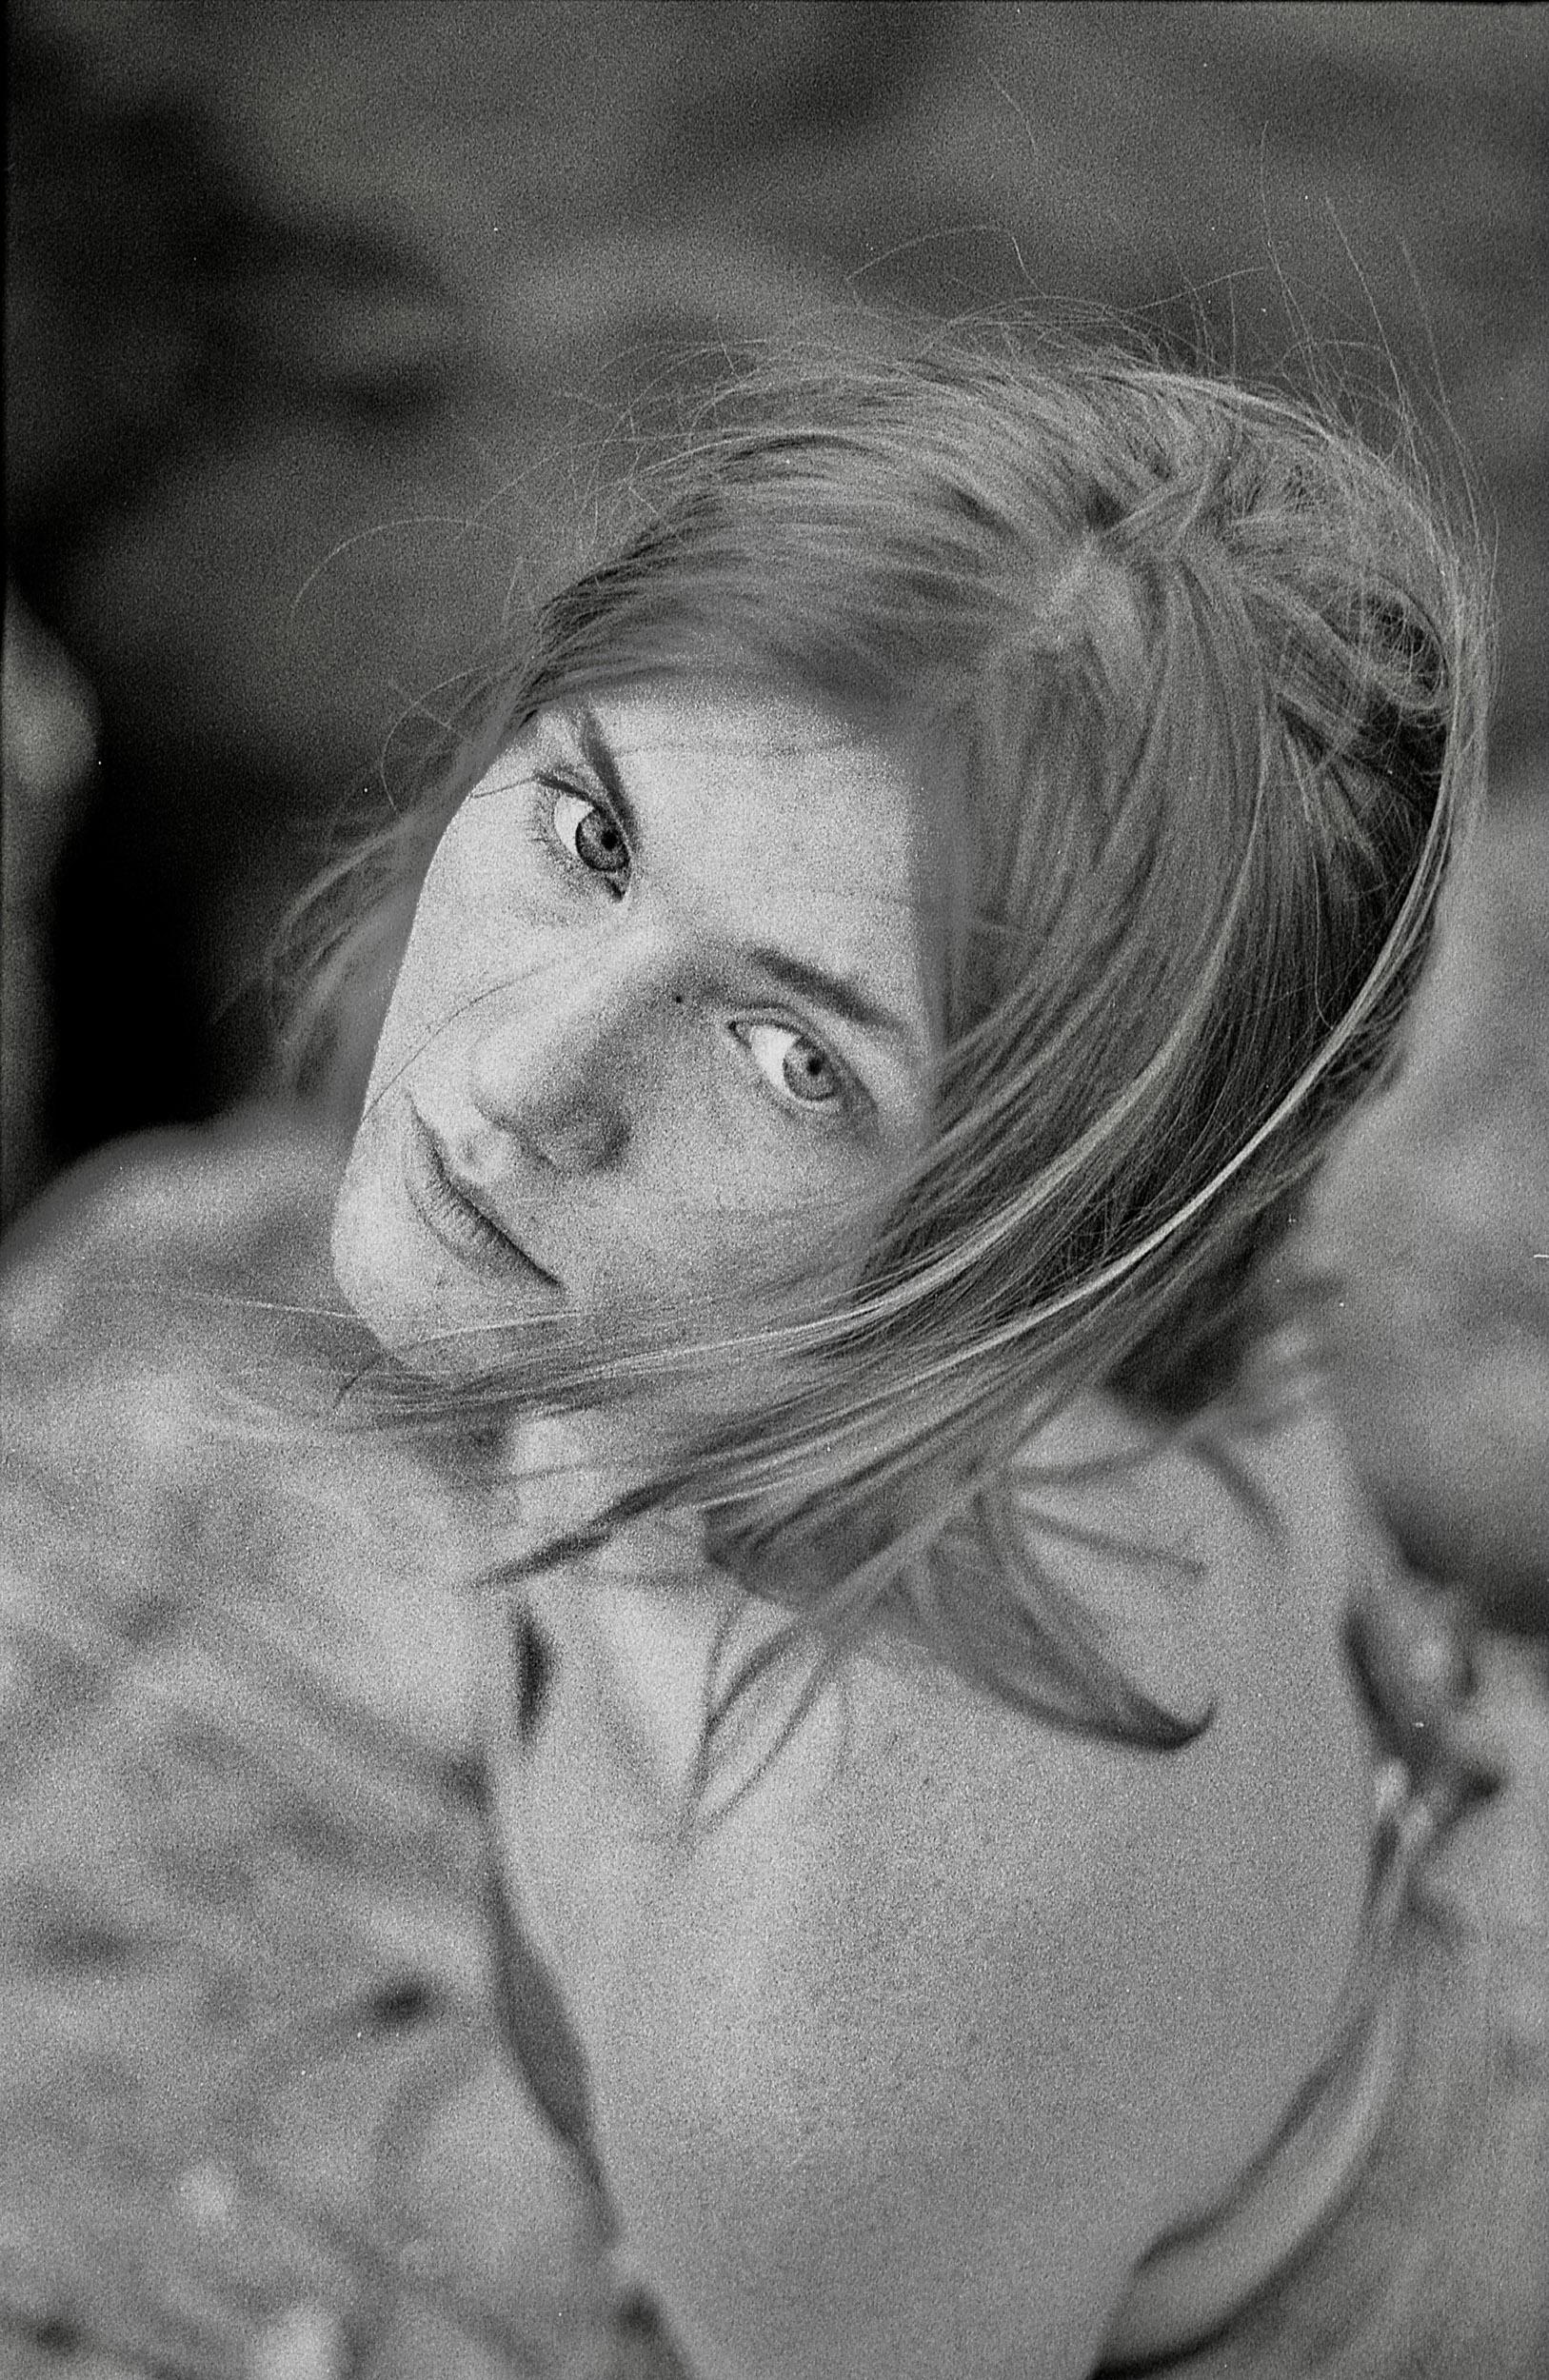 Categorie: Portrait, Glamour - Ph: LAURA SELVATICI - Model: EMMA APRILE, ROBERTA TASCA- Location: Skopelos, Grecia